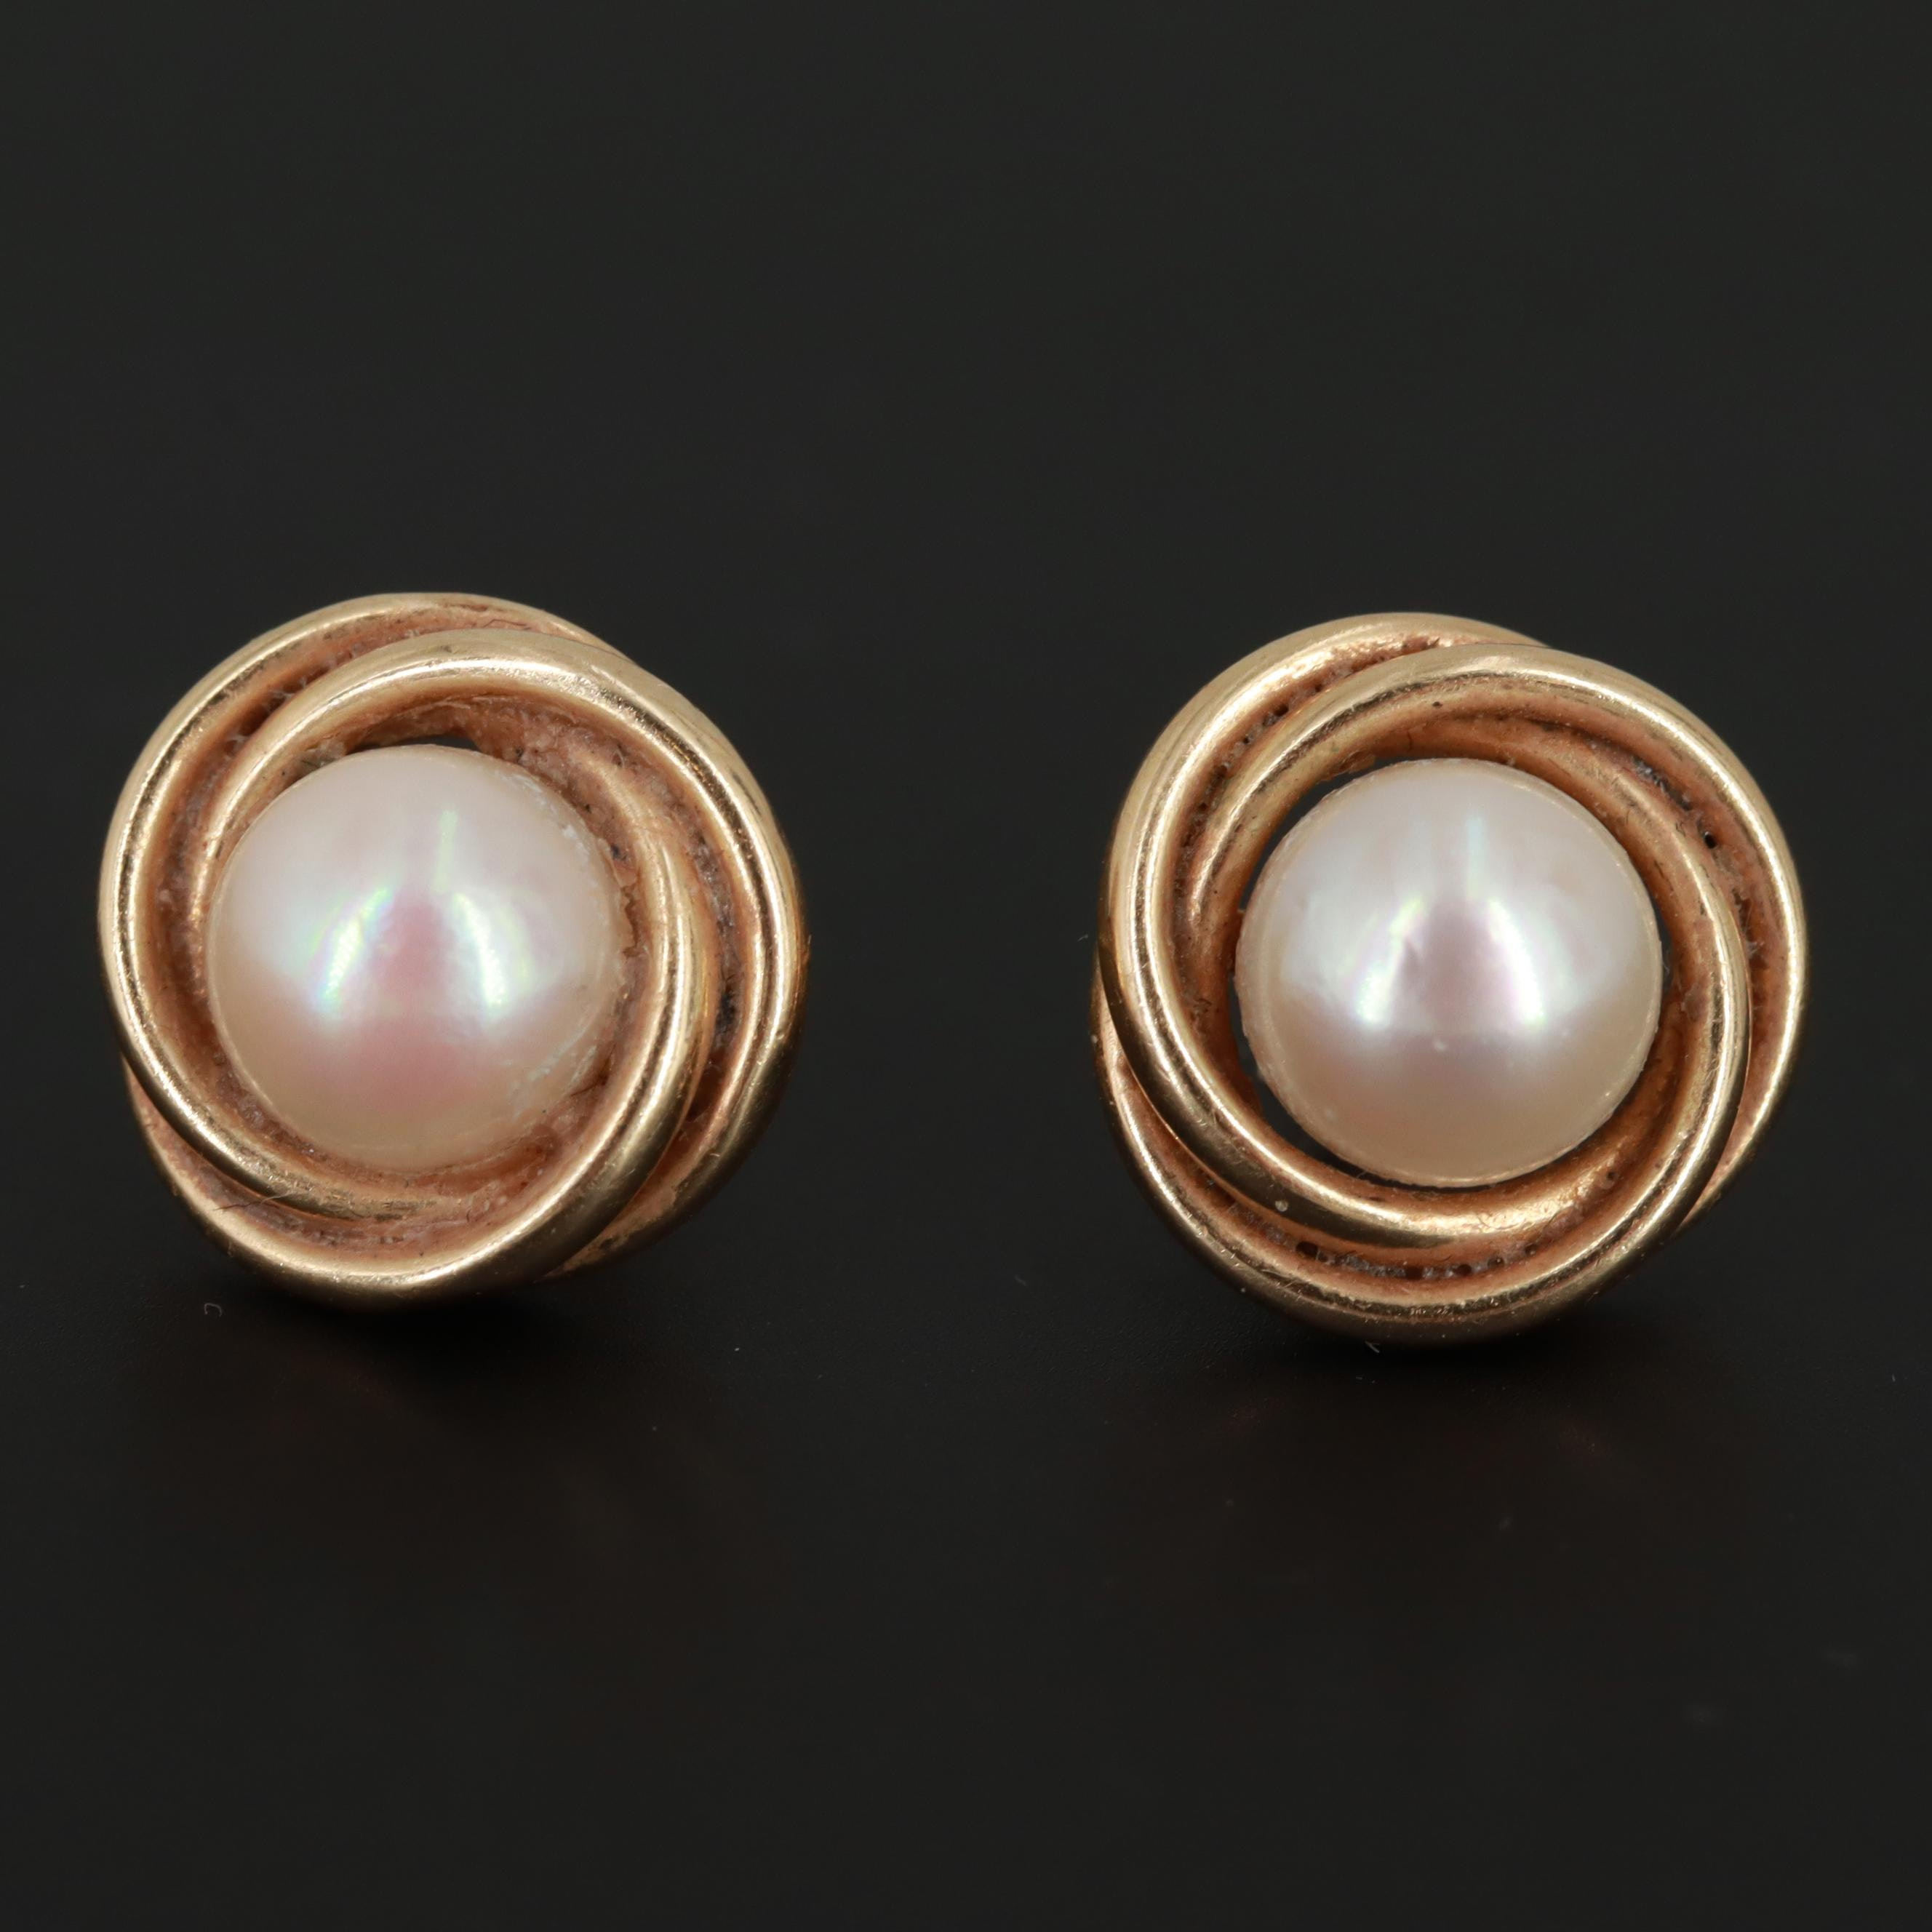 14K Yellow Gold Cultured Pearl Stud Earrings